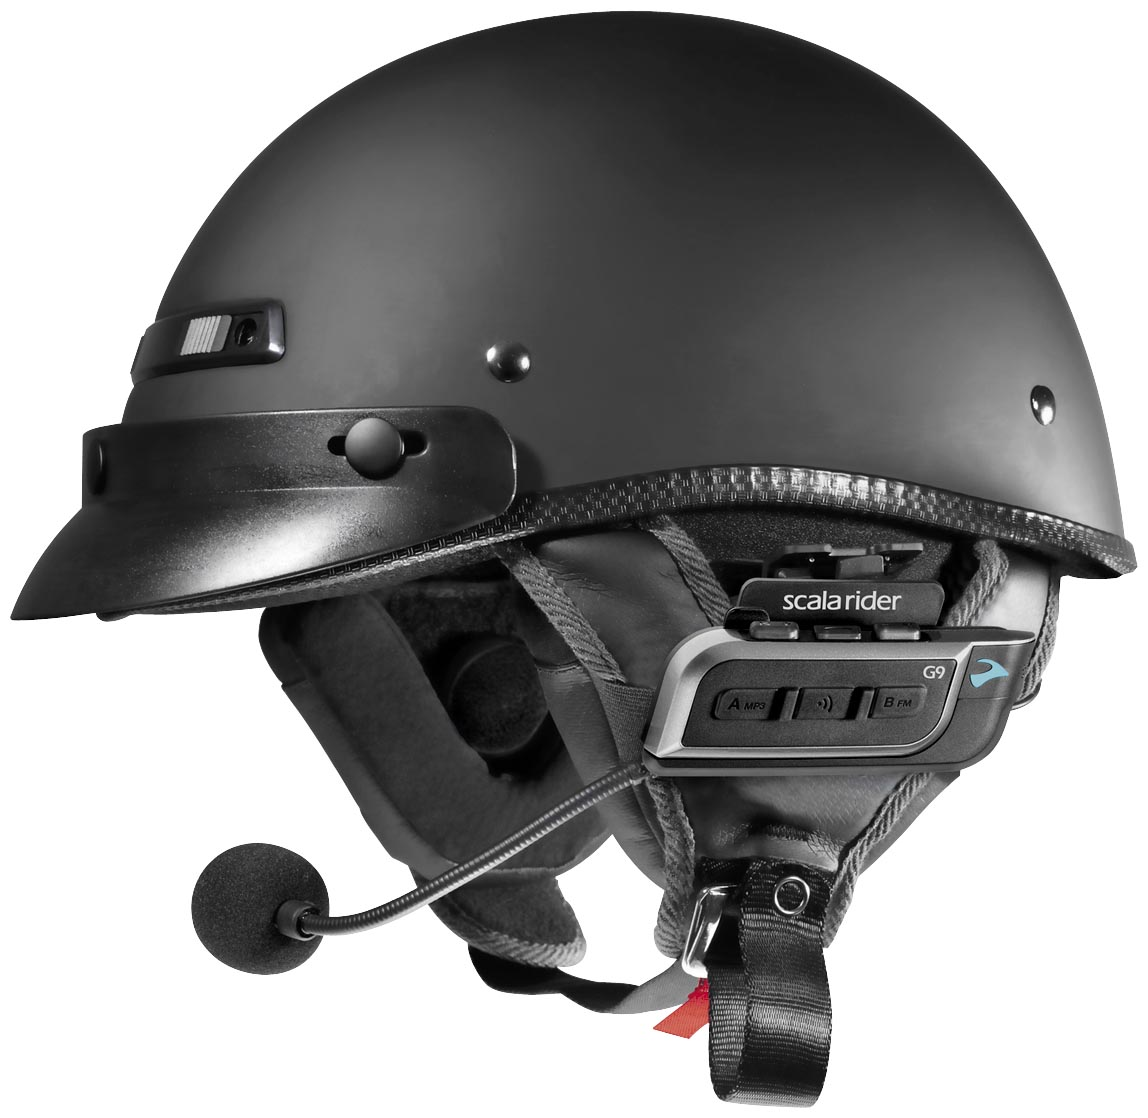 Scala Rider Half Helmet Audio Kit for G9 Headset